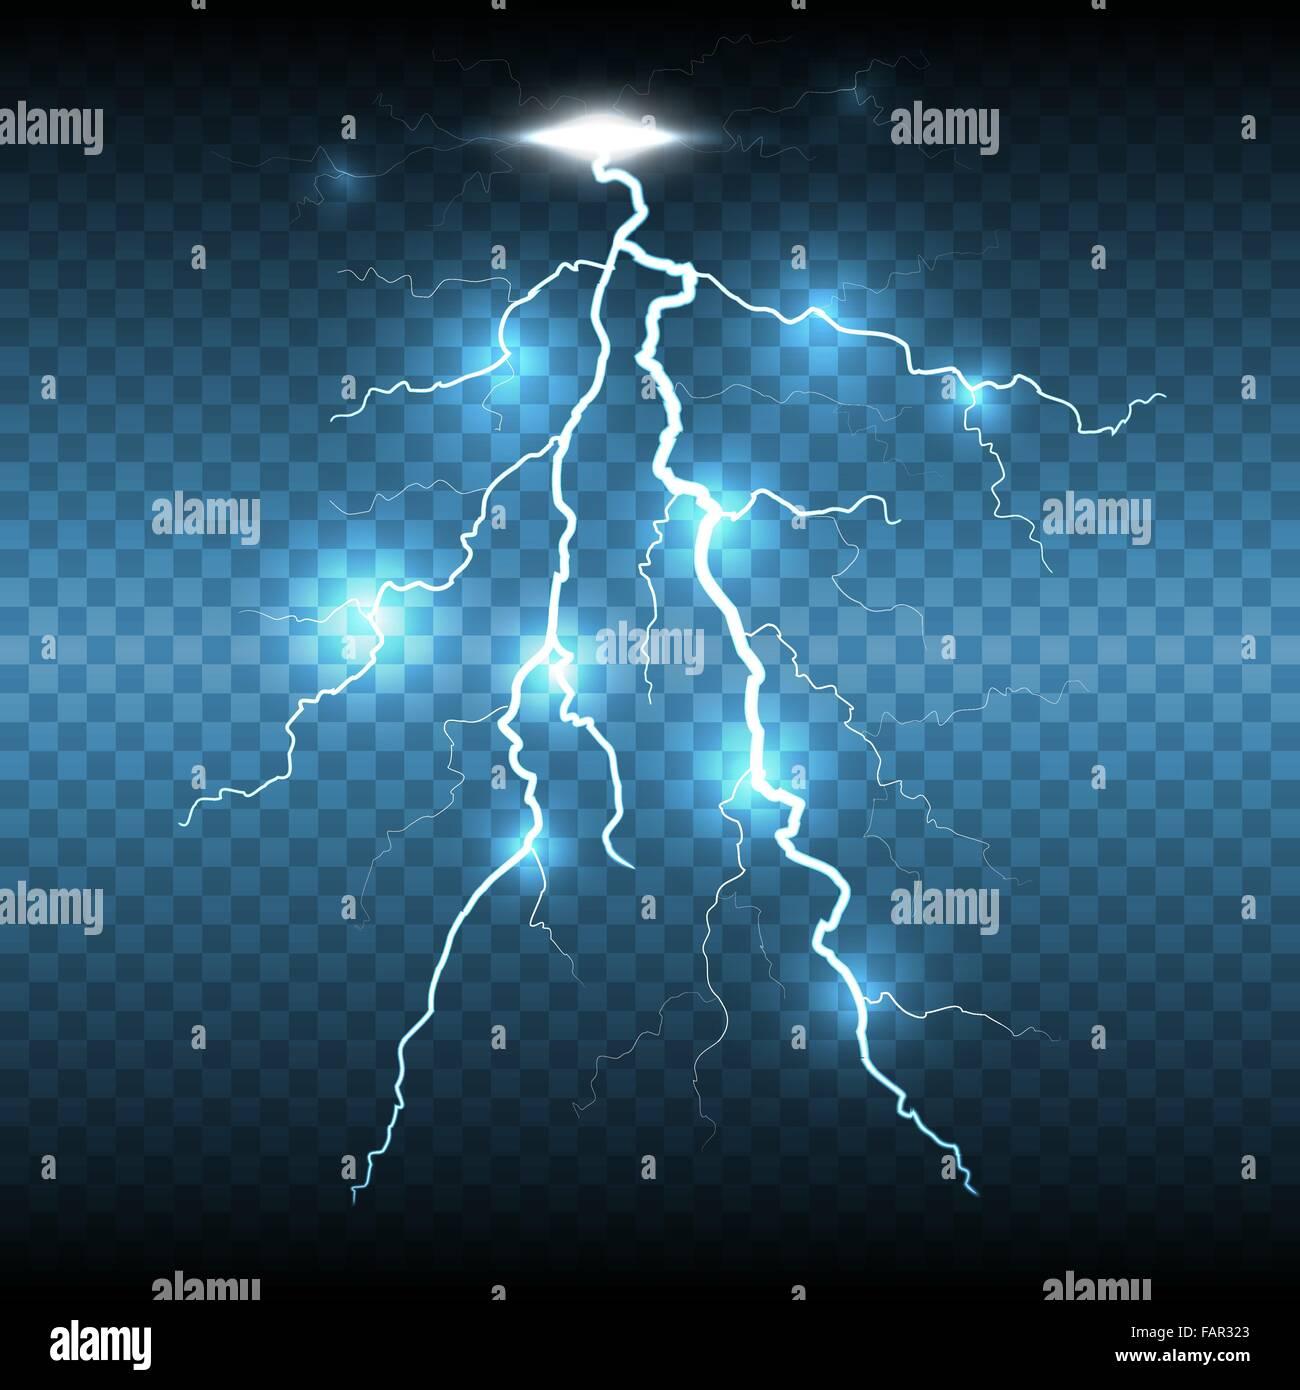 lightning flash strike transparent background stock vector art